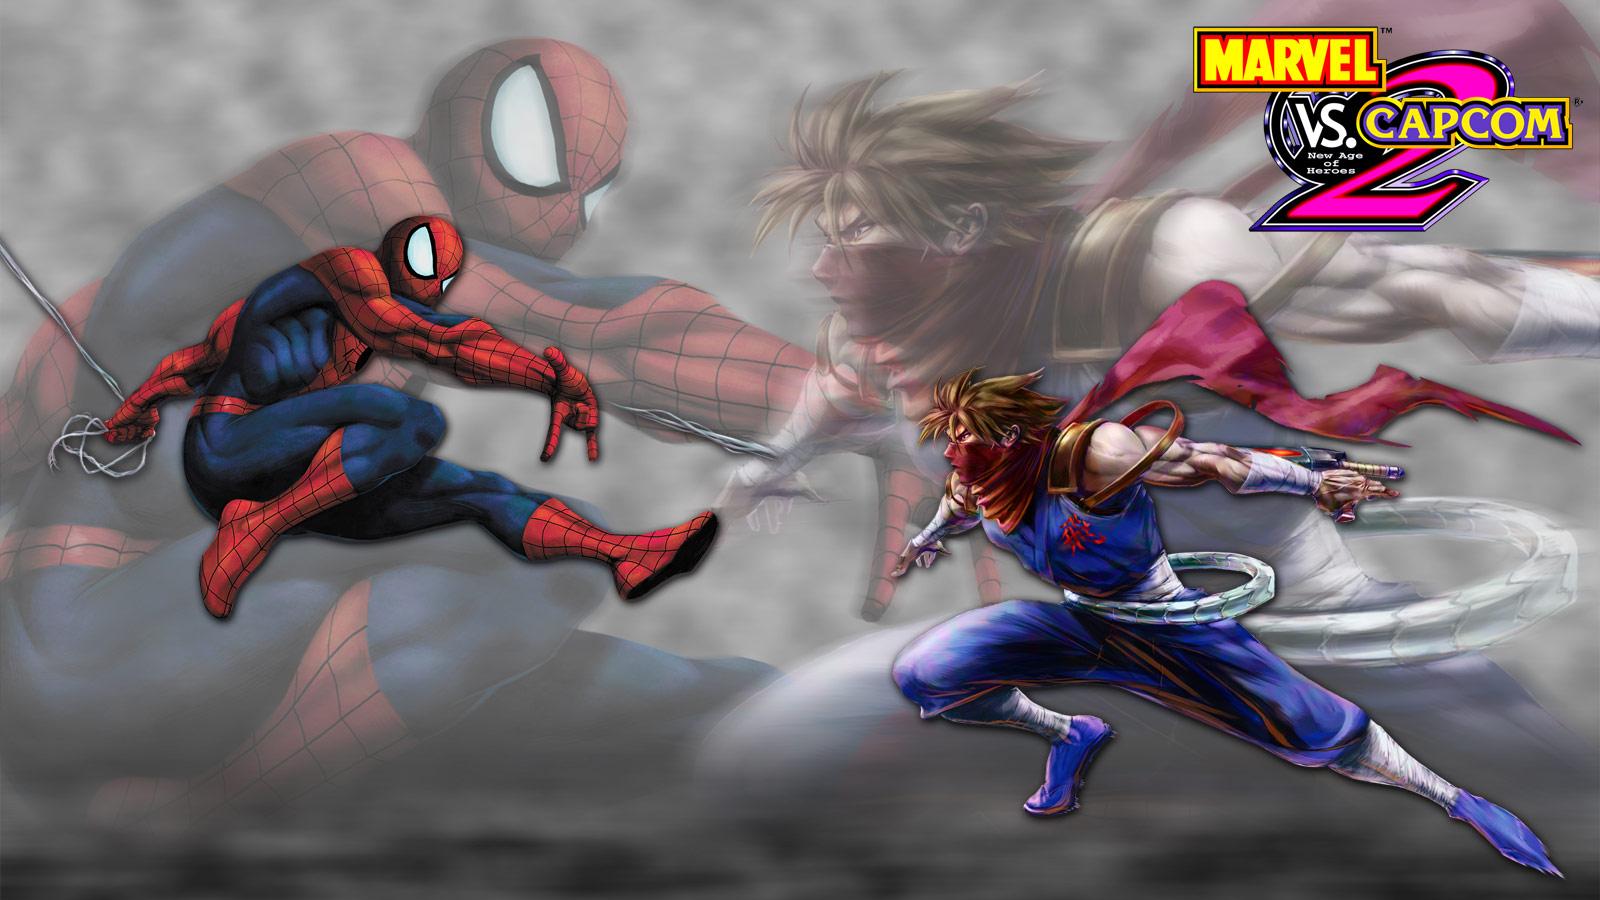 Marvel vs. Capcom 2 artwork, Spider-Man vs. Strider